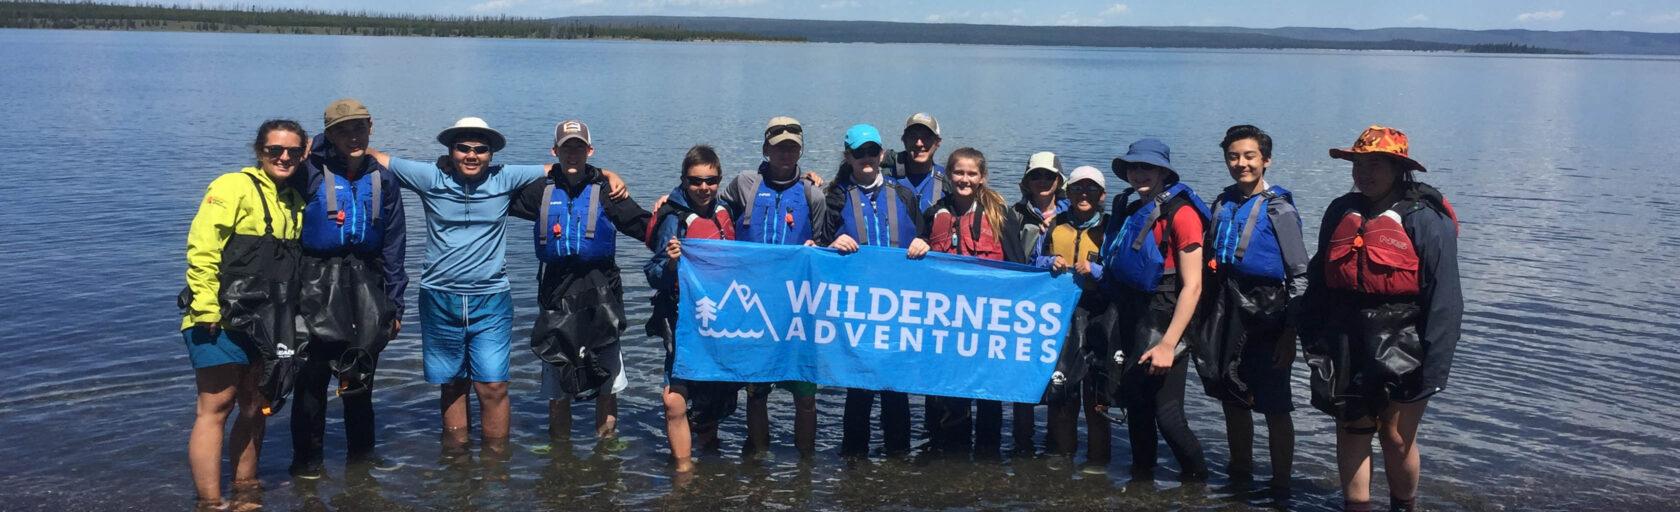 Yellowstone Explorer group photo with the WA flag